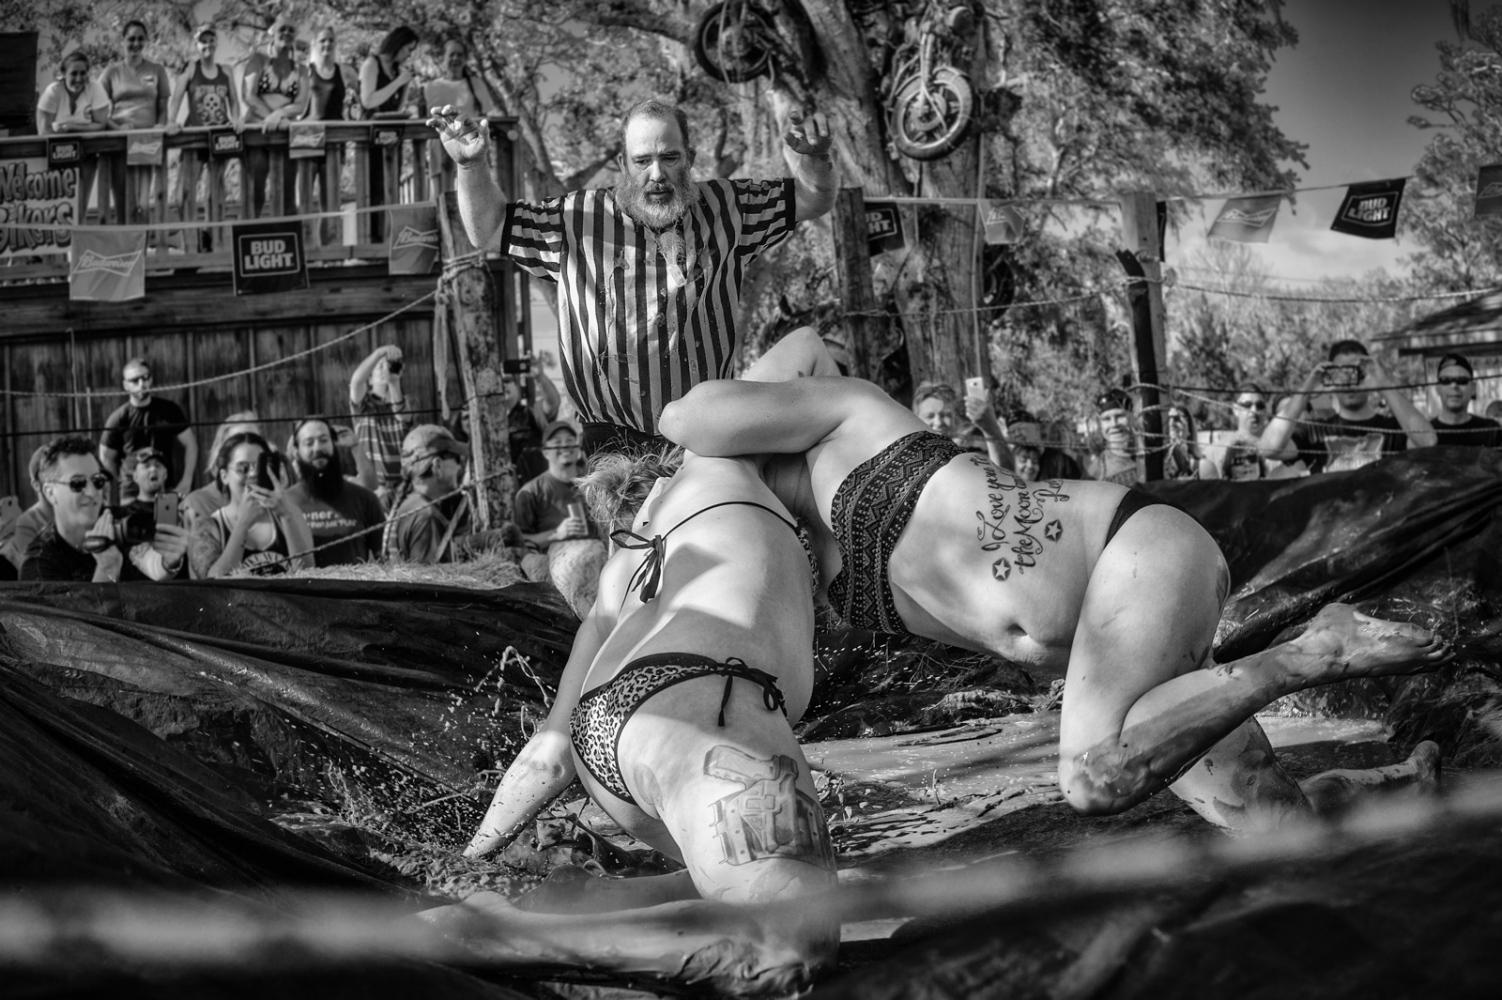 Mud Wrestling BikeWeek 2016 at the No Name Bar, Edgewater, Florida